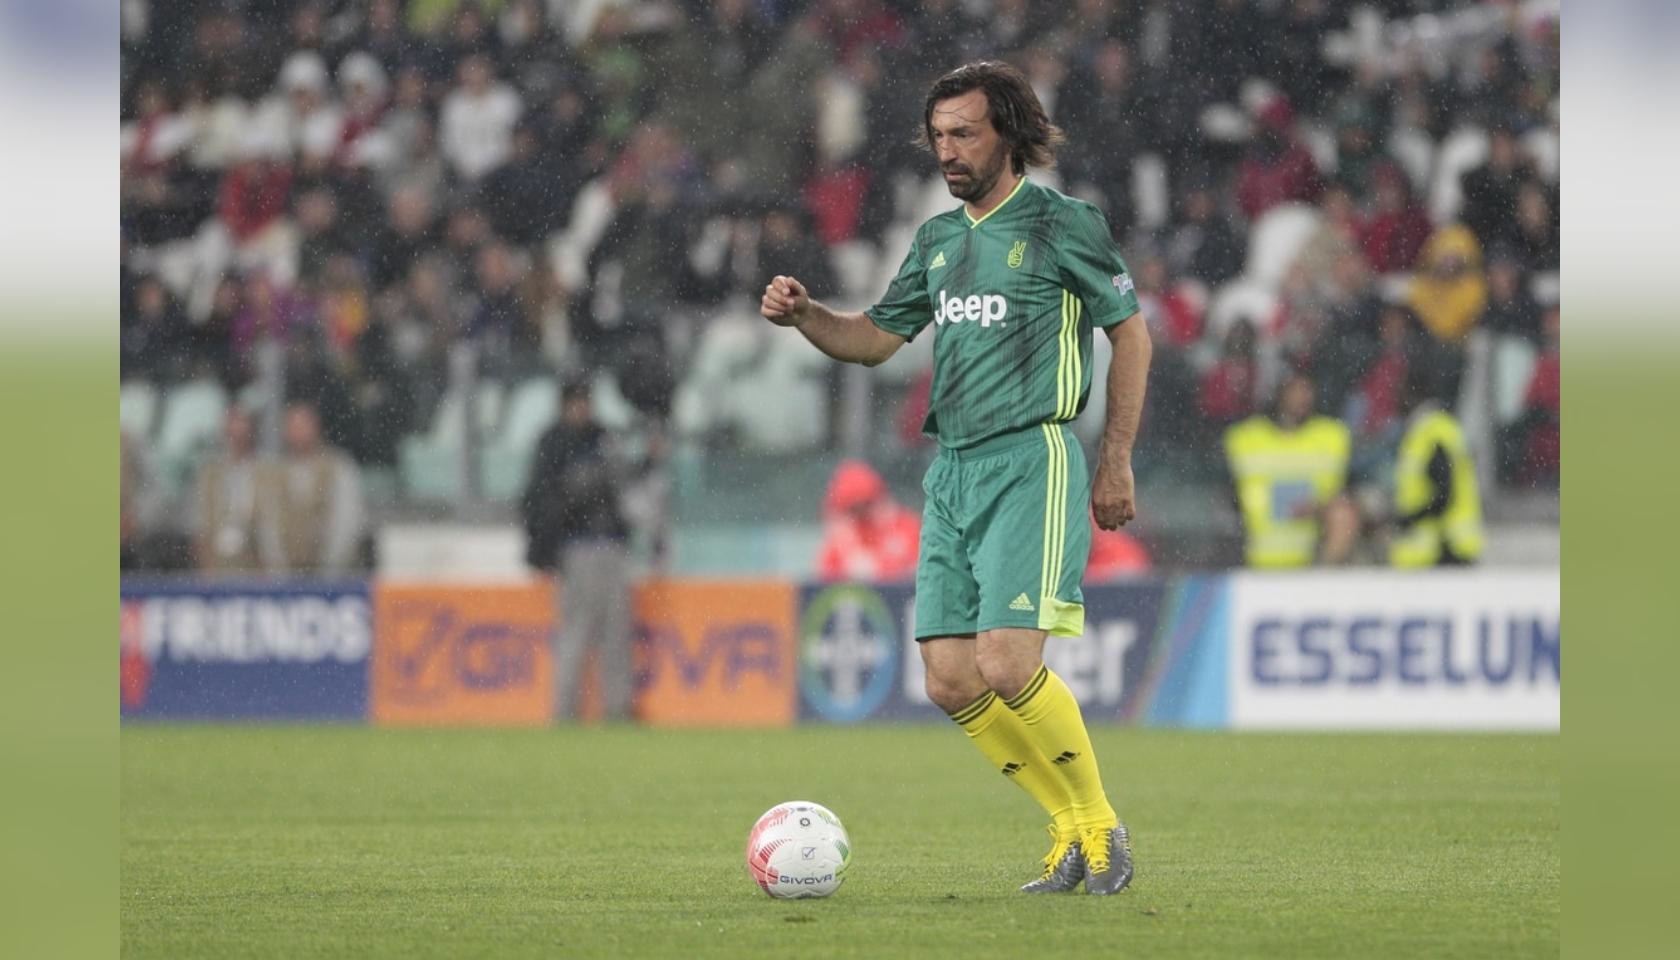 Pirlo's Signed Match Shirt, Partita del Cuore 2019 ...